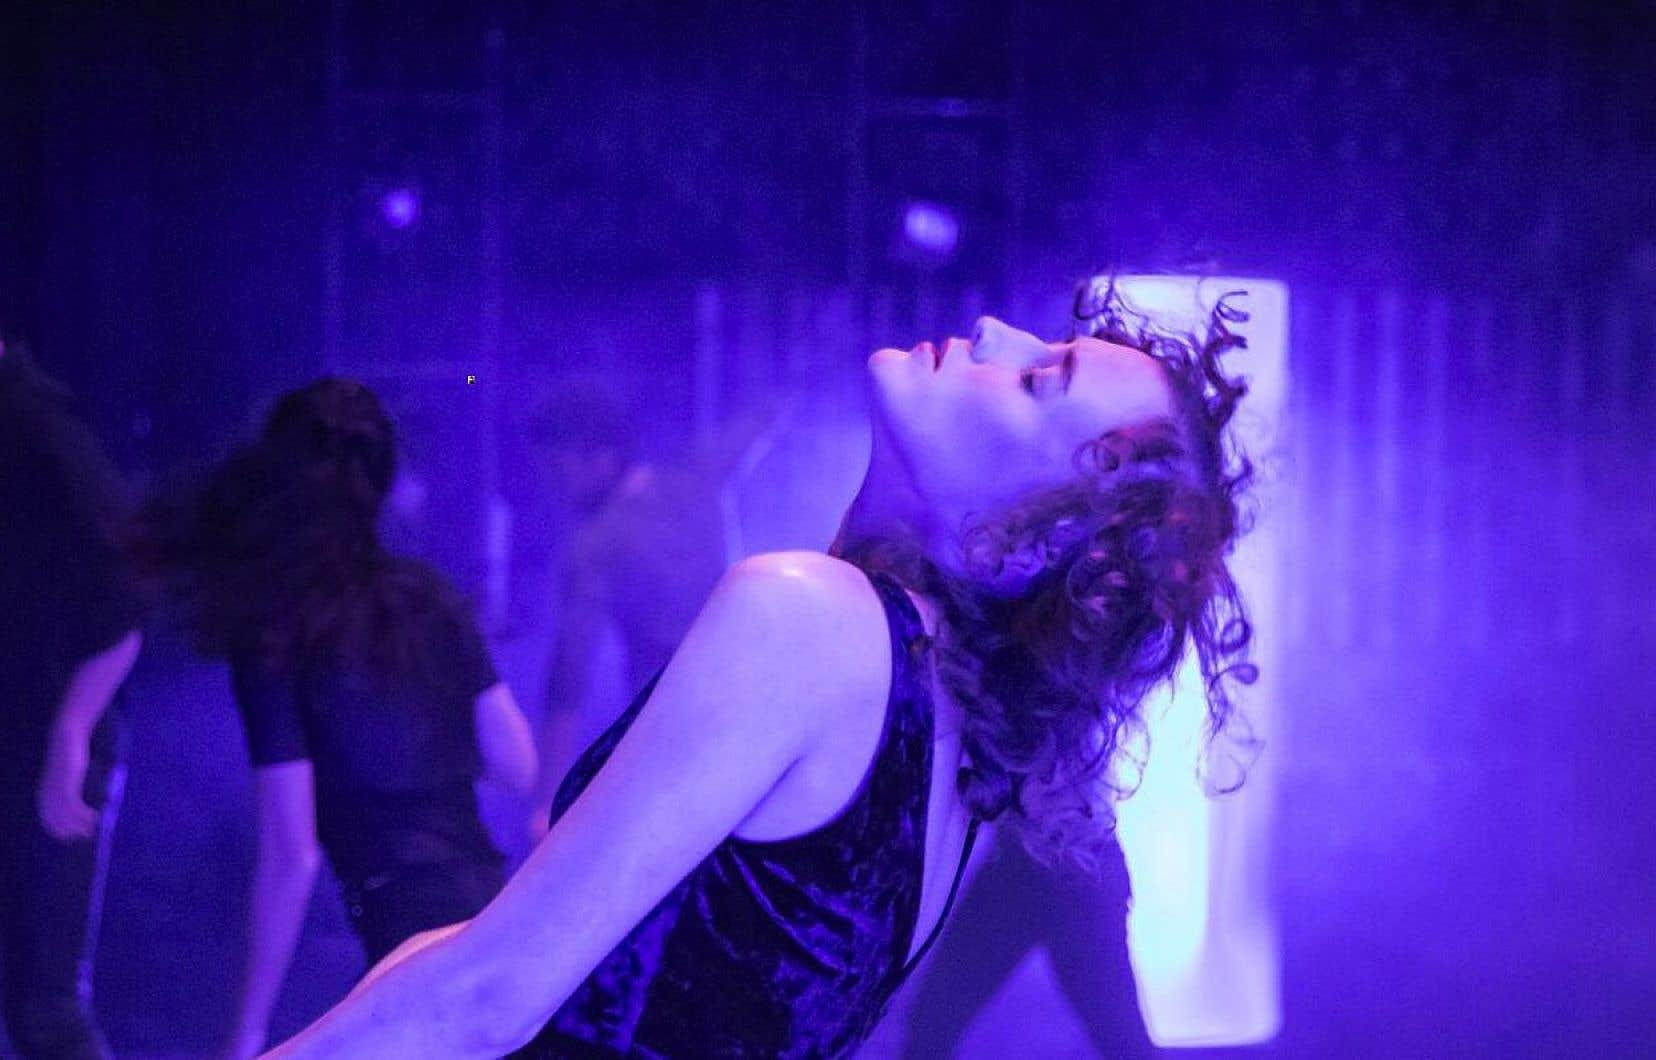 La pièce «Notre innocence» évoque l'innocence perdue au contact de la mort.